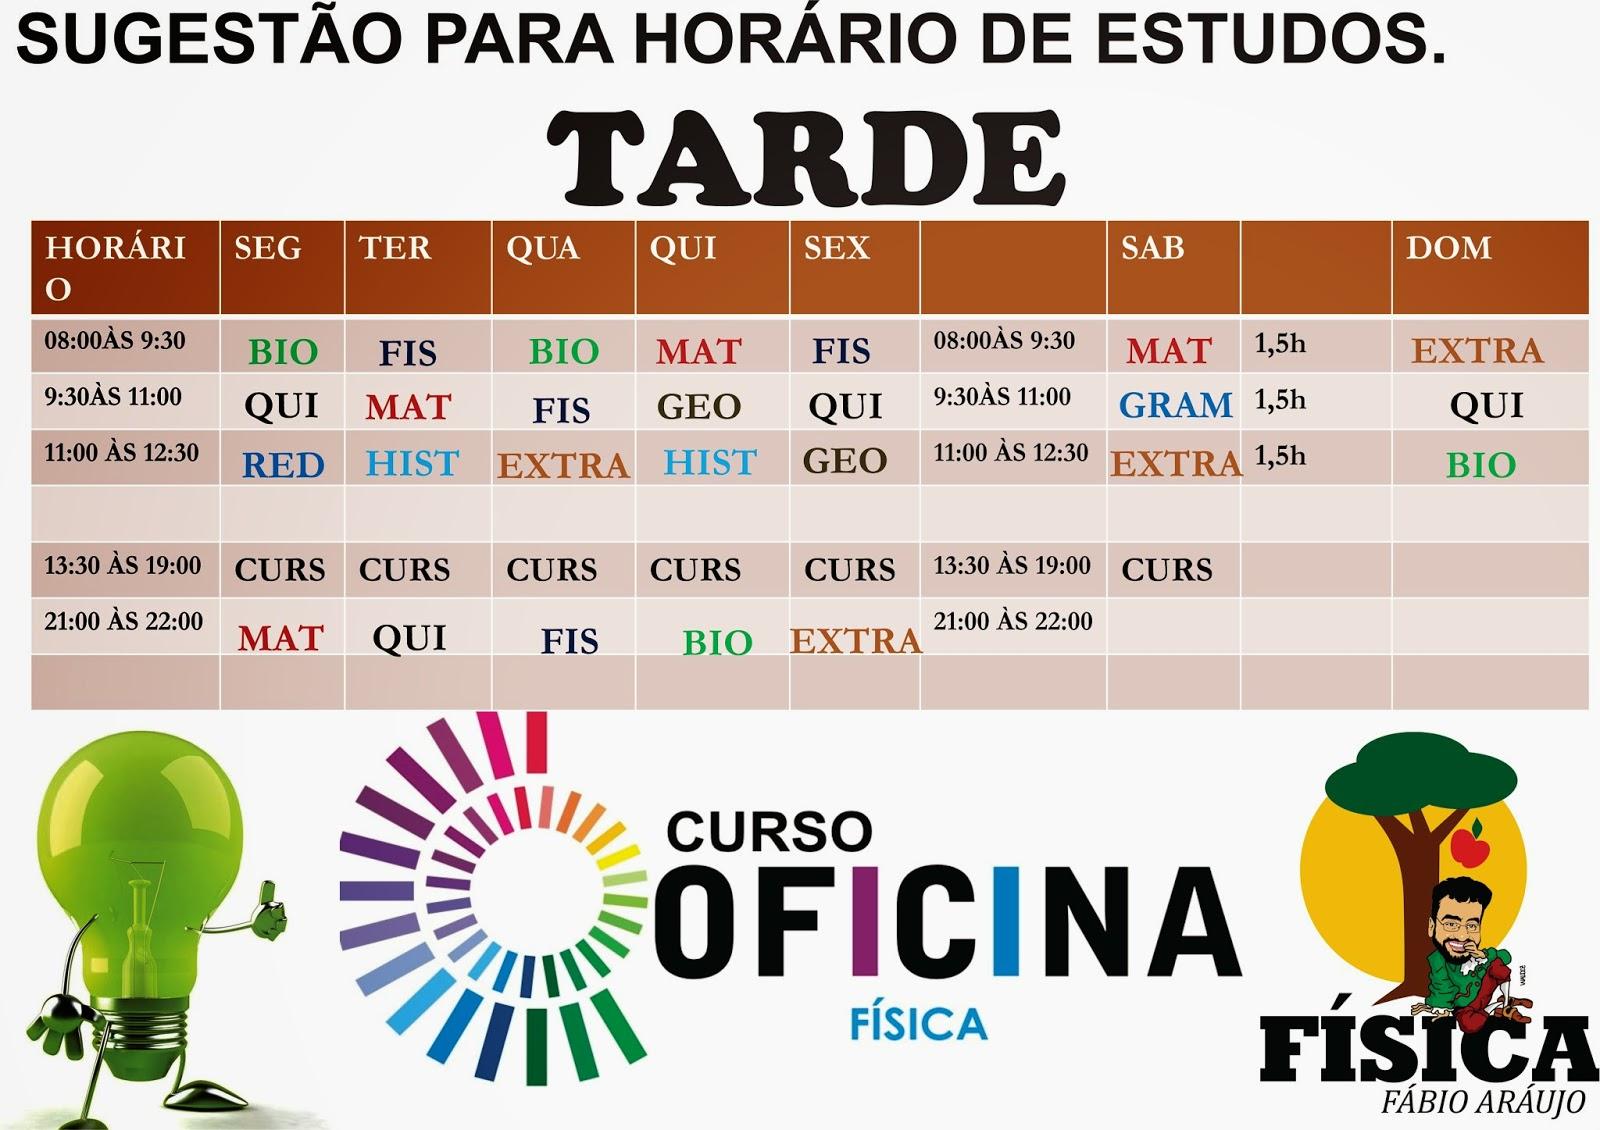 HORARIO+DE+ESTUDO+TARDE.jpg